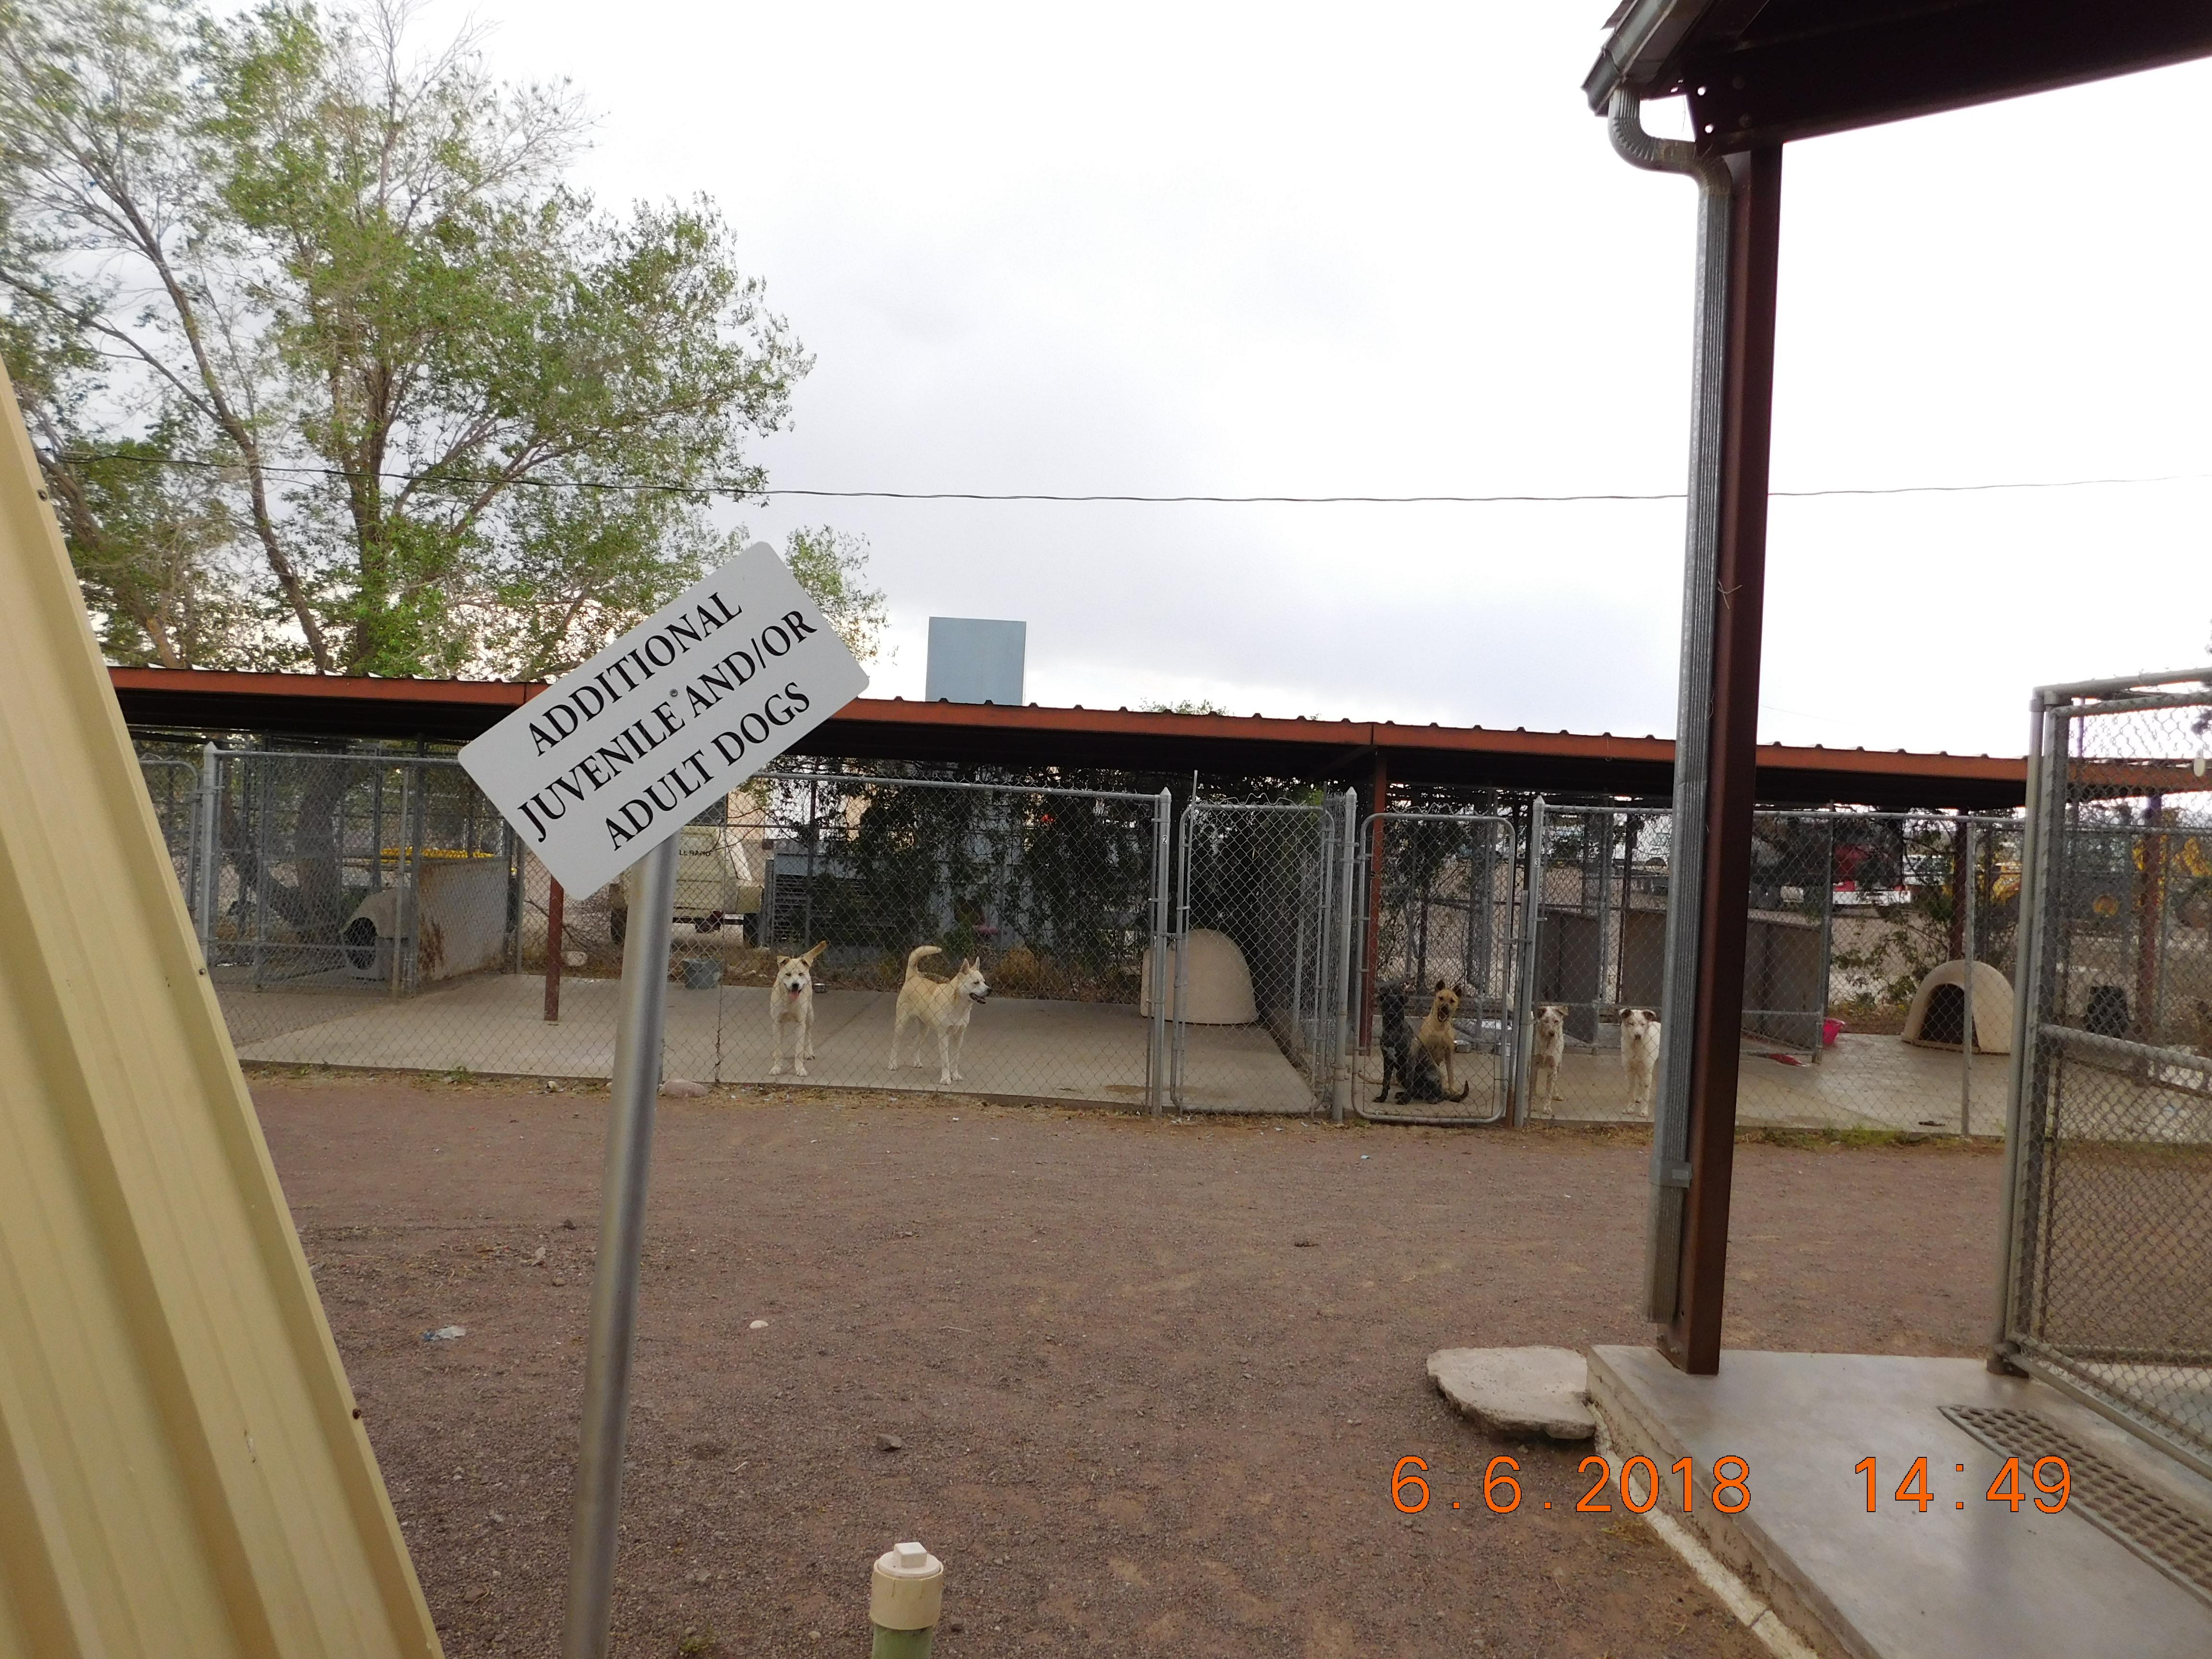 Outside kennels dog friendly area.